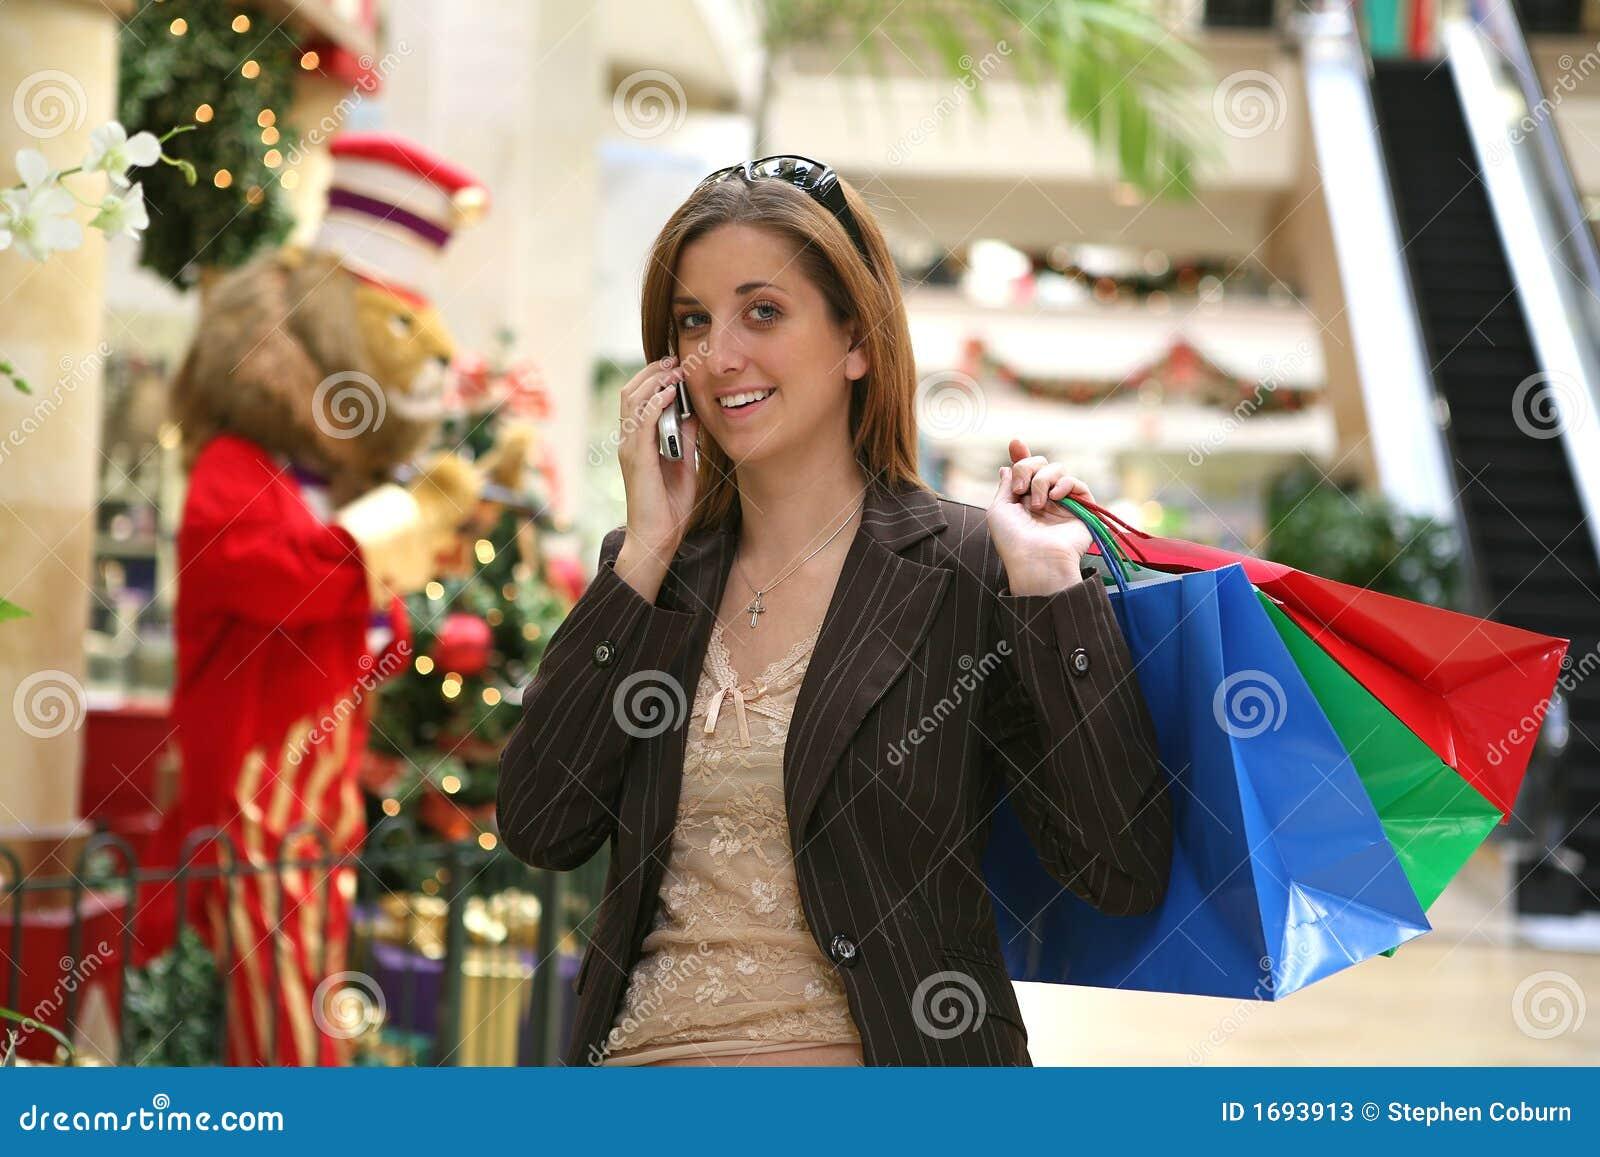 Woman Christmas Shopping Stock Photos Image 1693913